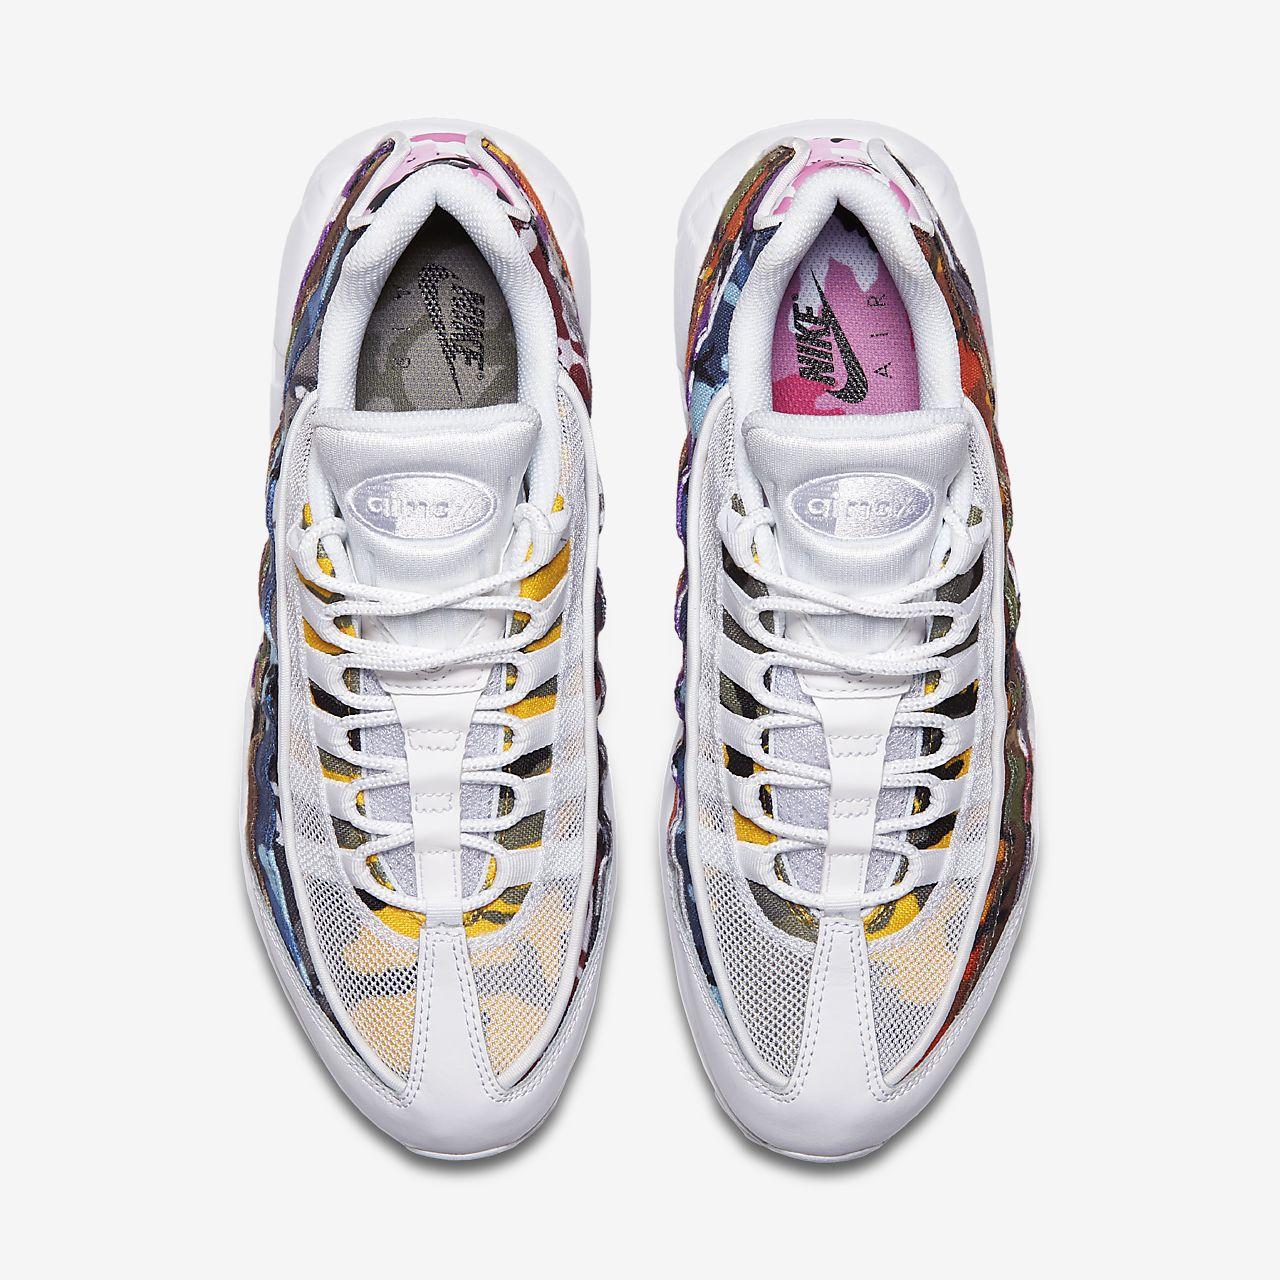 8f6715c7a7503 Nike Air Max 95 OG MC SP Men's Shoe. Nike.com GB